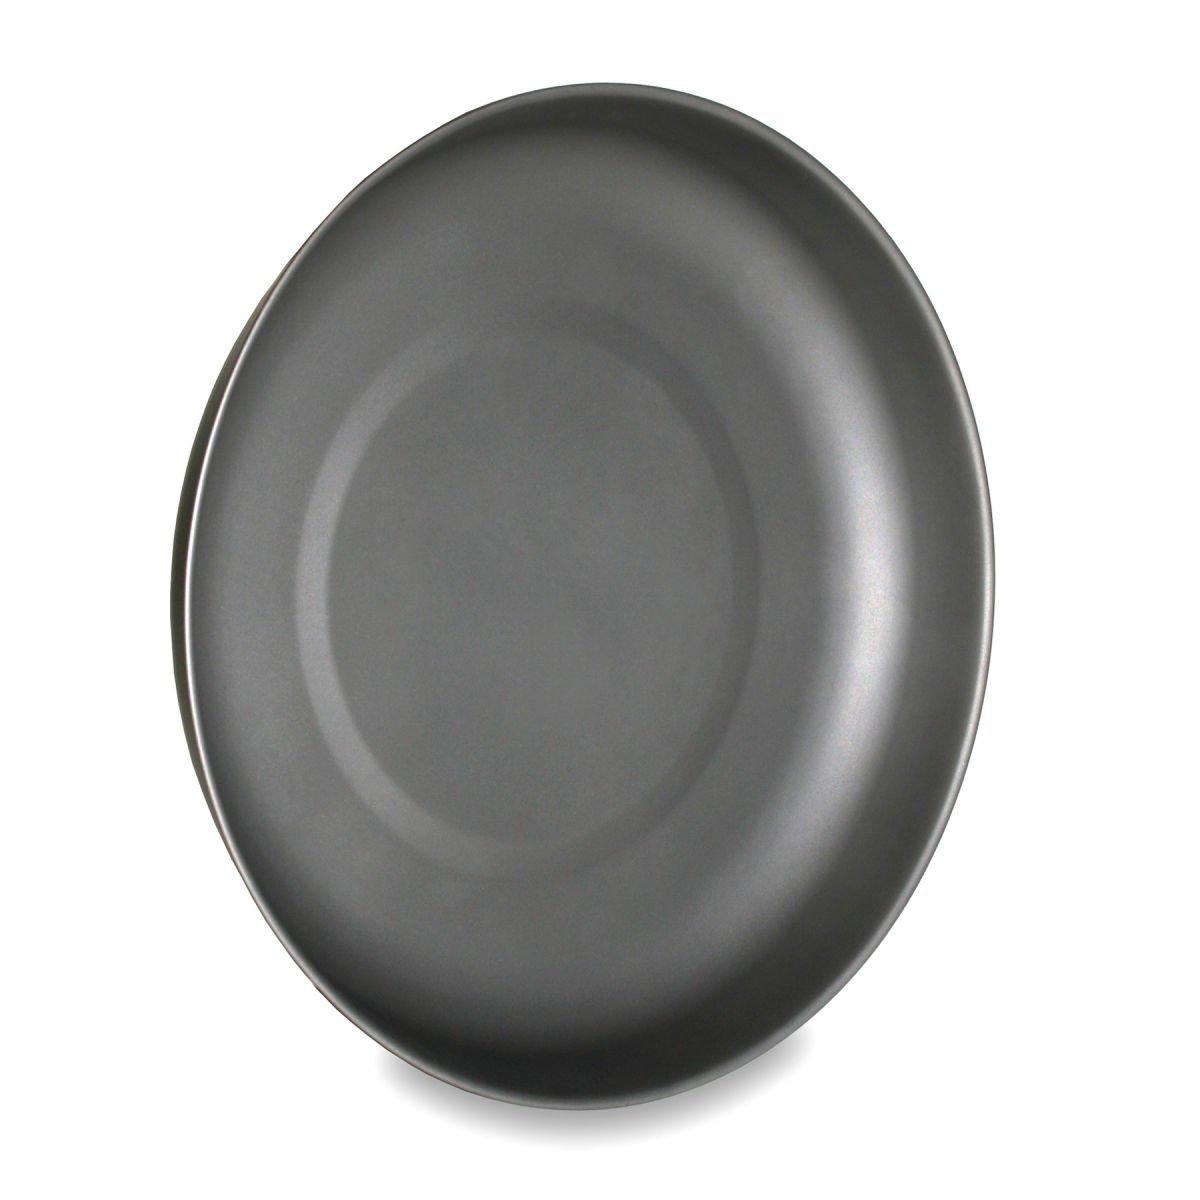 LifeVenture Titanium Plate One Size Grey